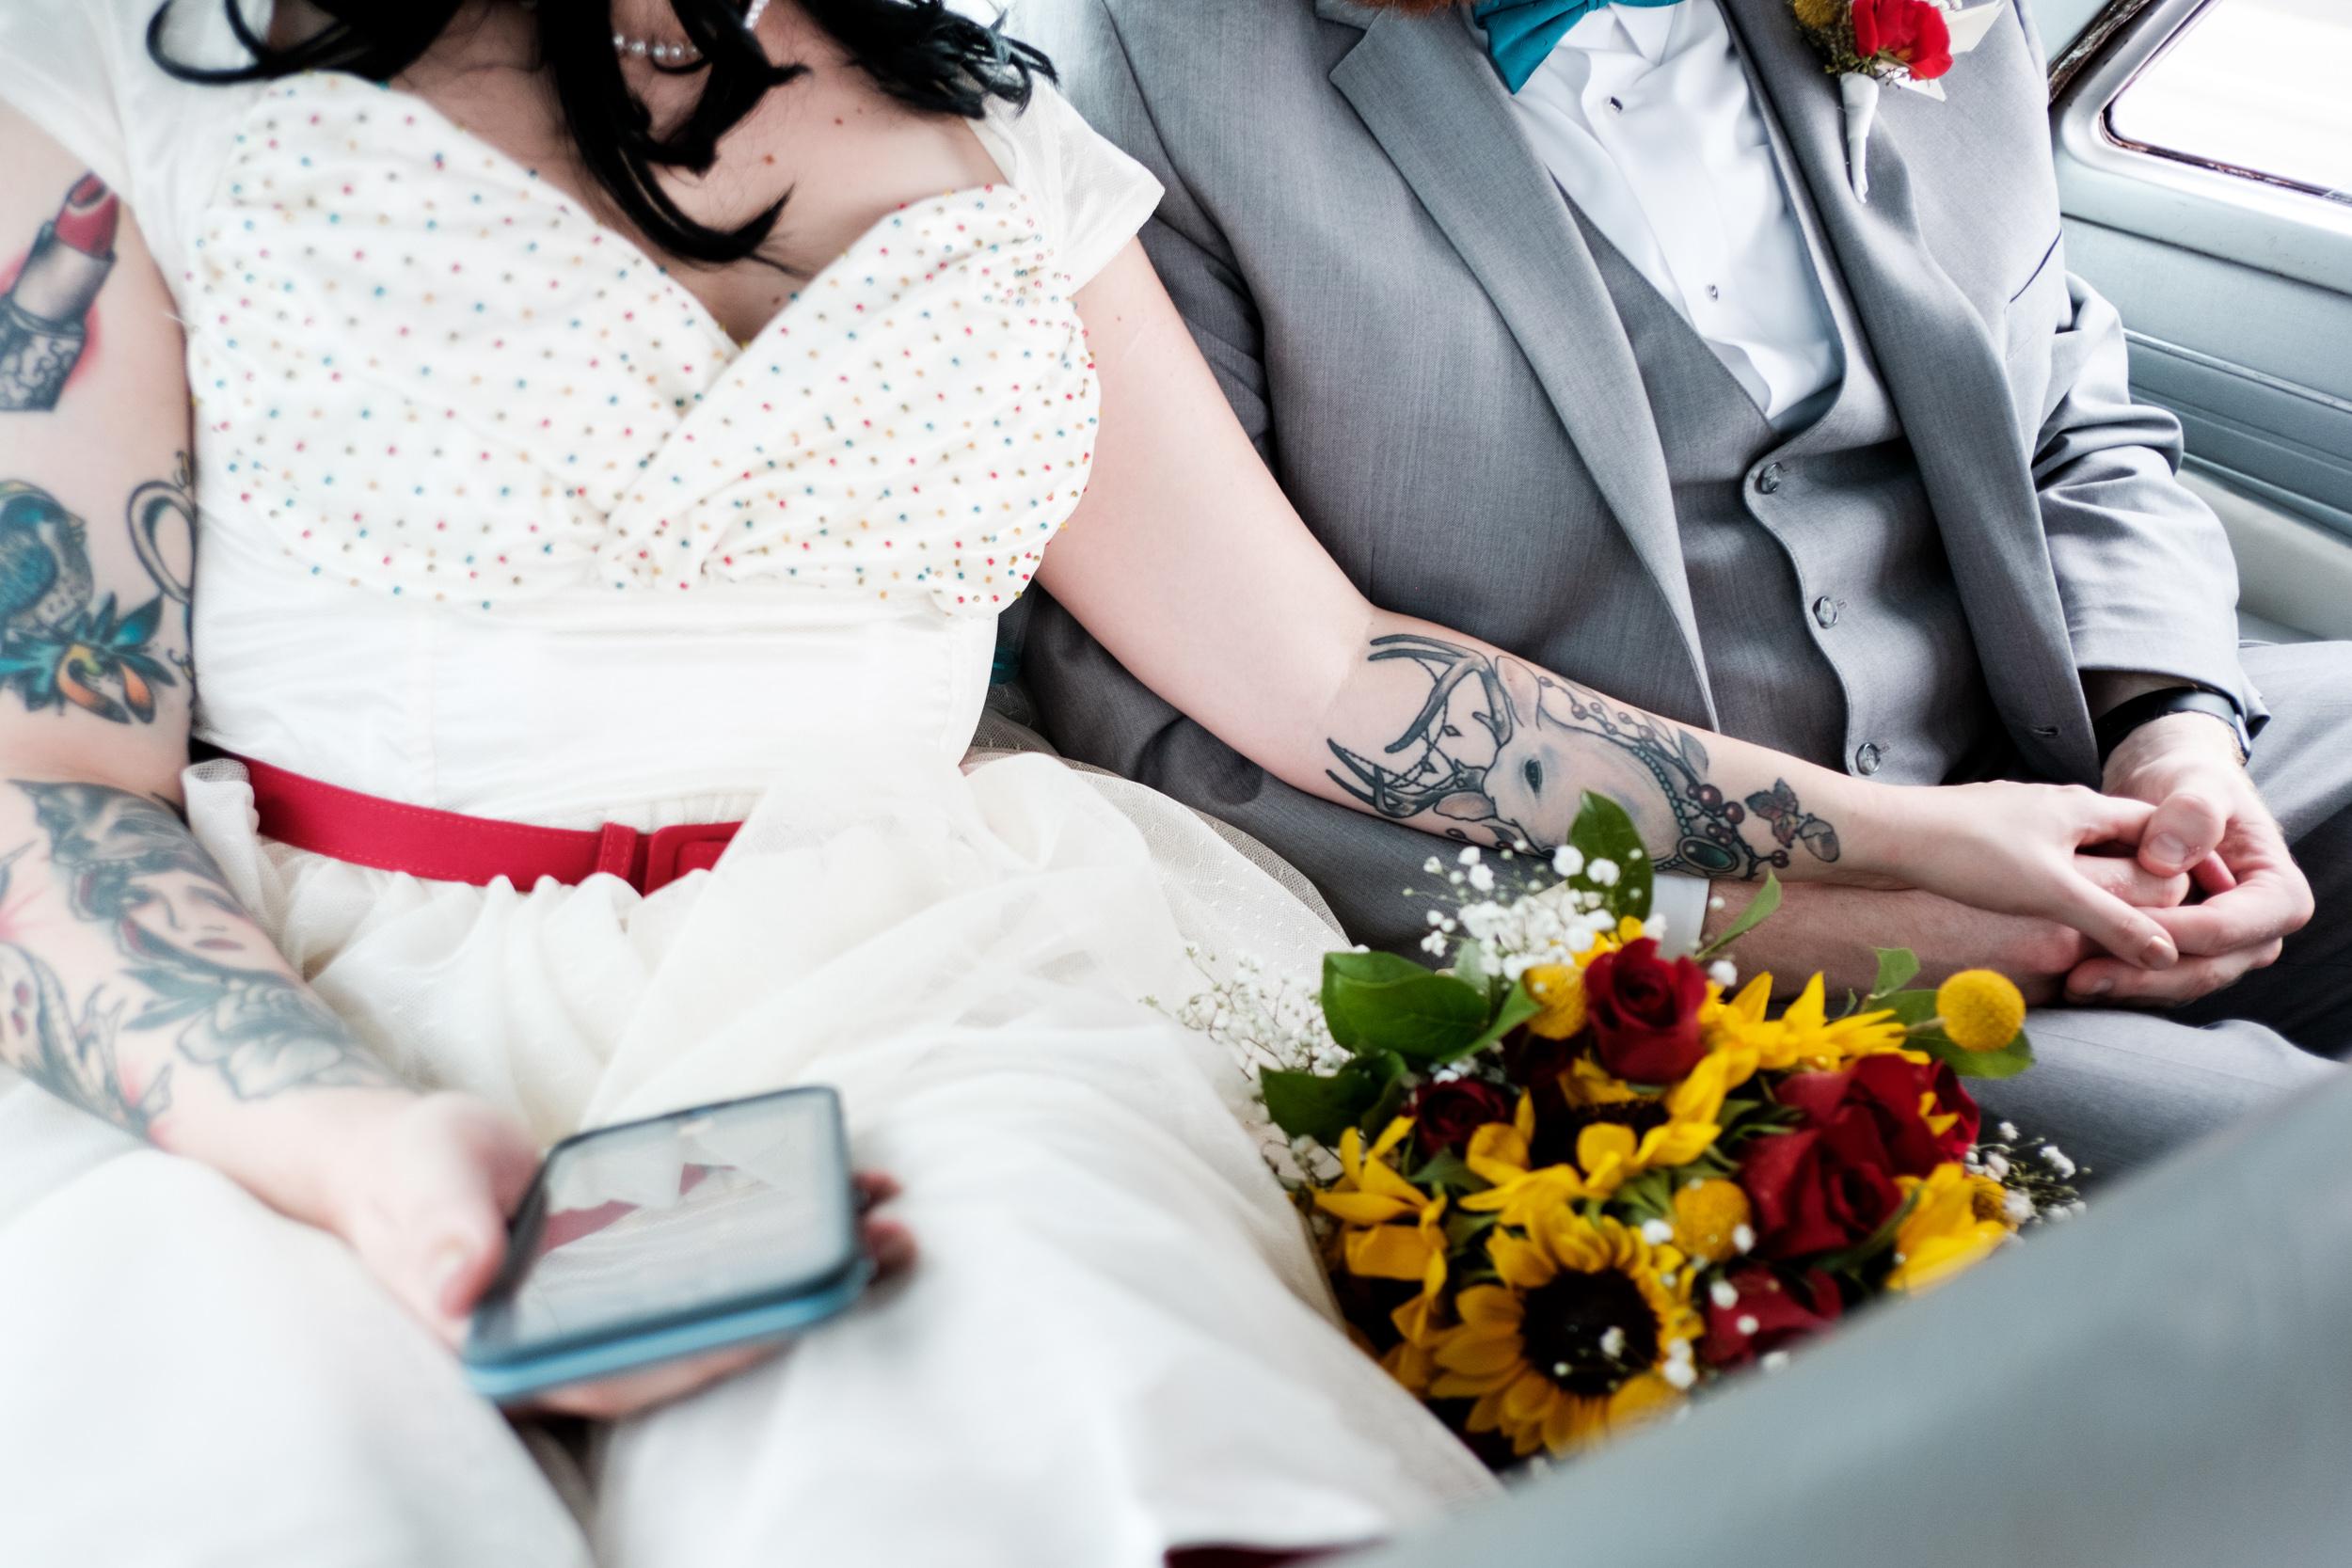 Christian & Sarah wedding photography by Brian milo-185.jpg